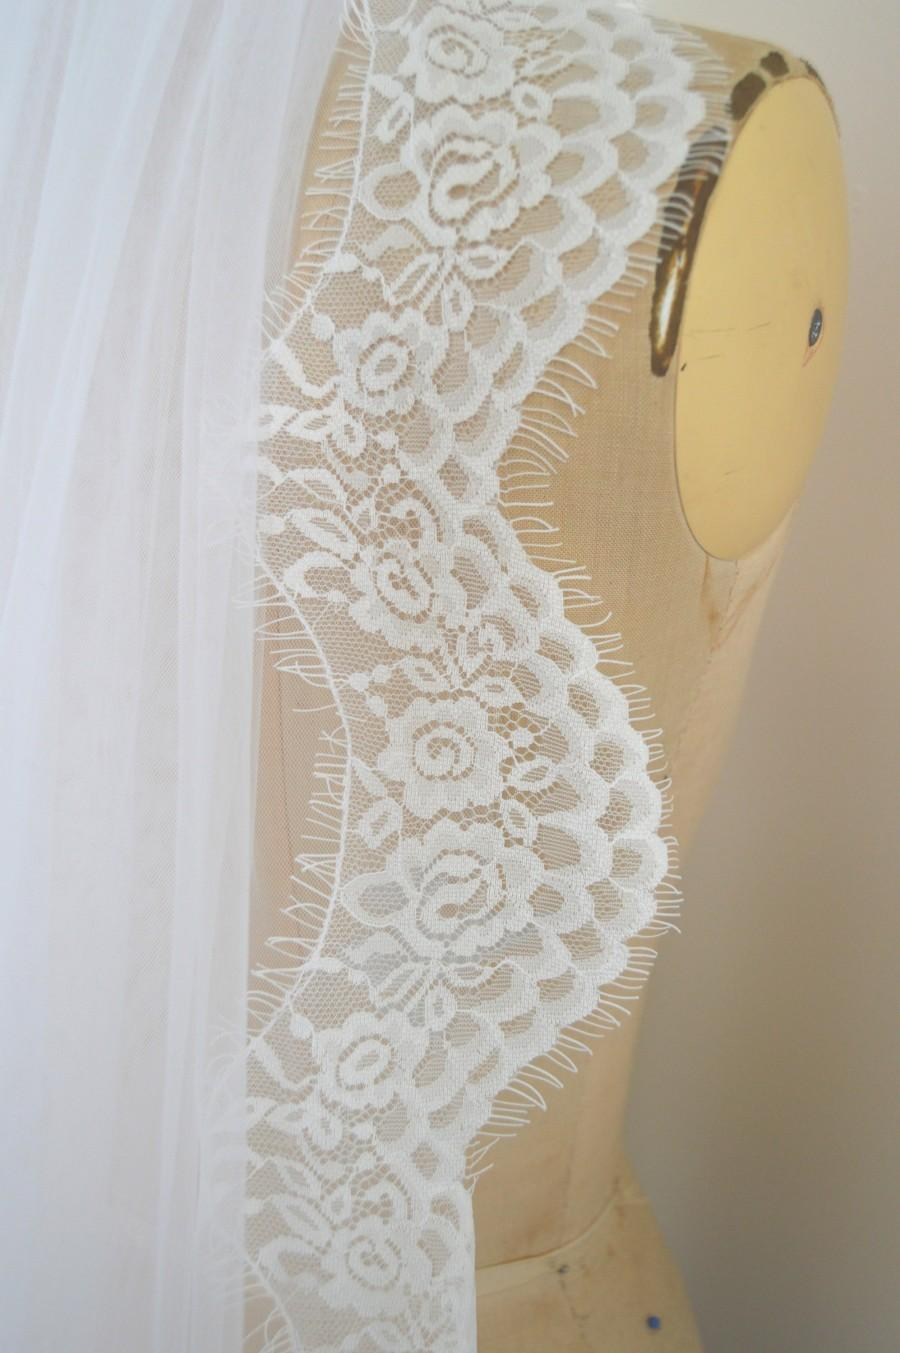 Wedding - Cathedral Length Wedding Veil 'Mia' - White Scalloped Eyelash Lace Edged Bridal Veil